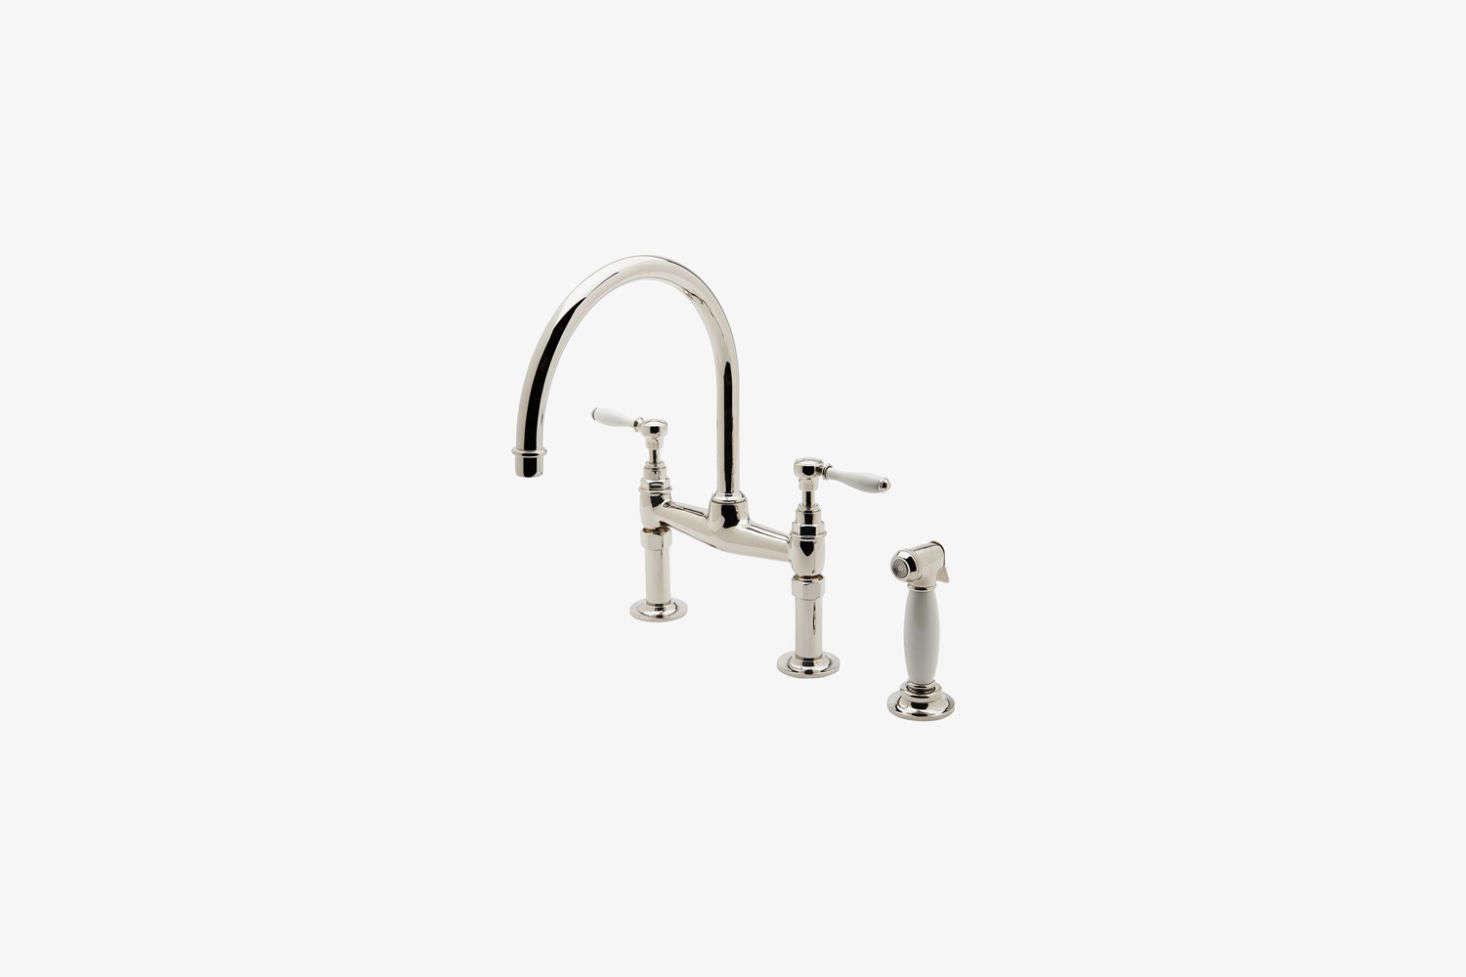 The Waterworks Easton Vintage Bridge Gooseneck Kitchen Faucet in shiny copper is $